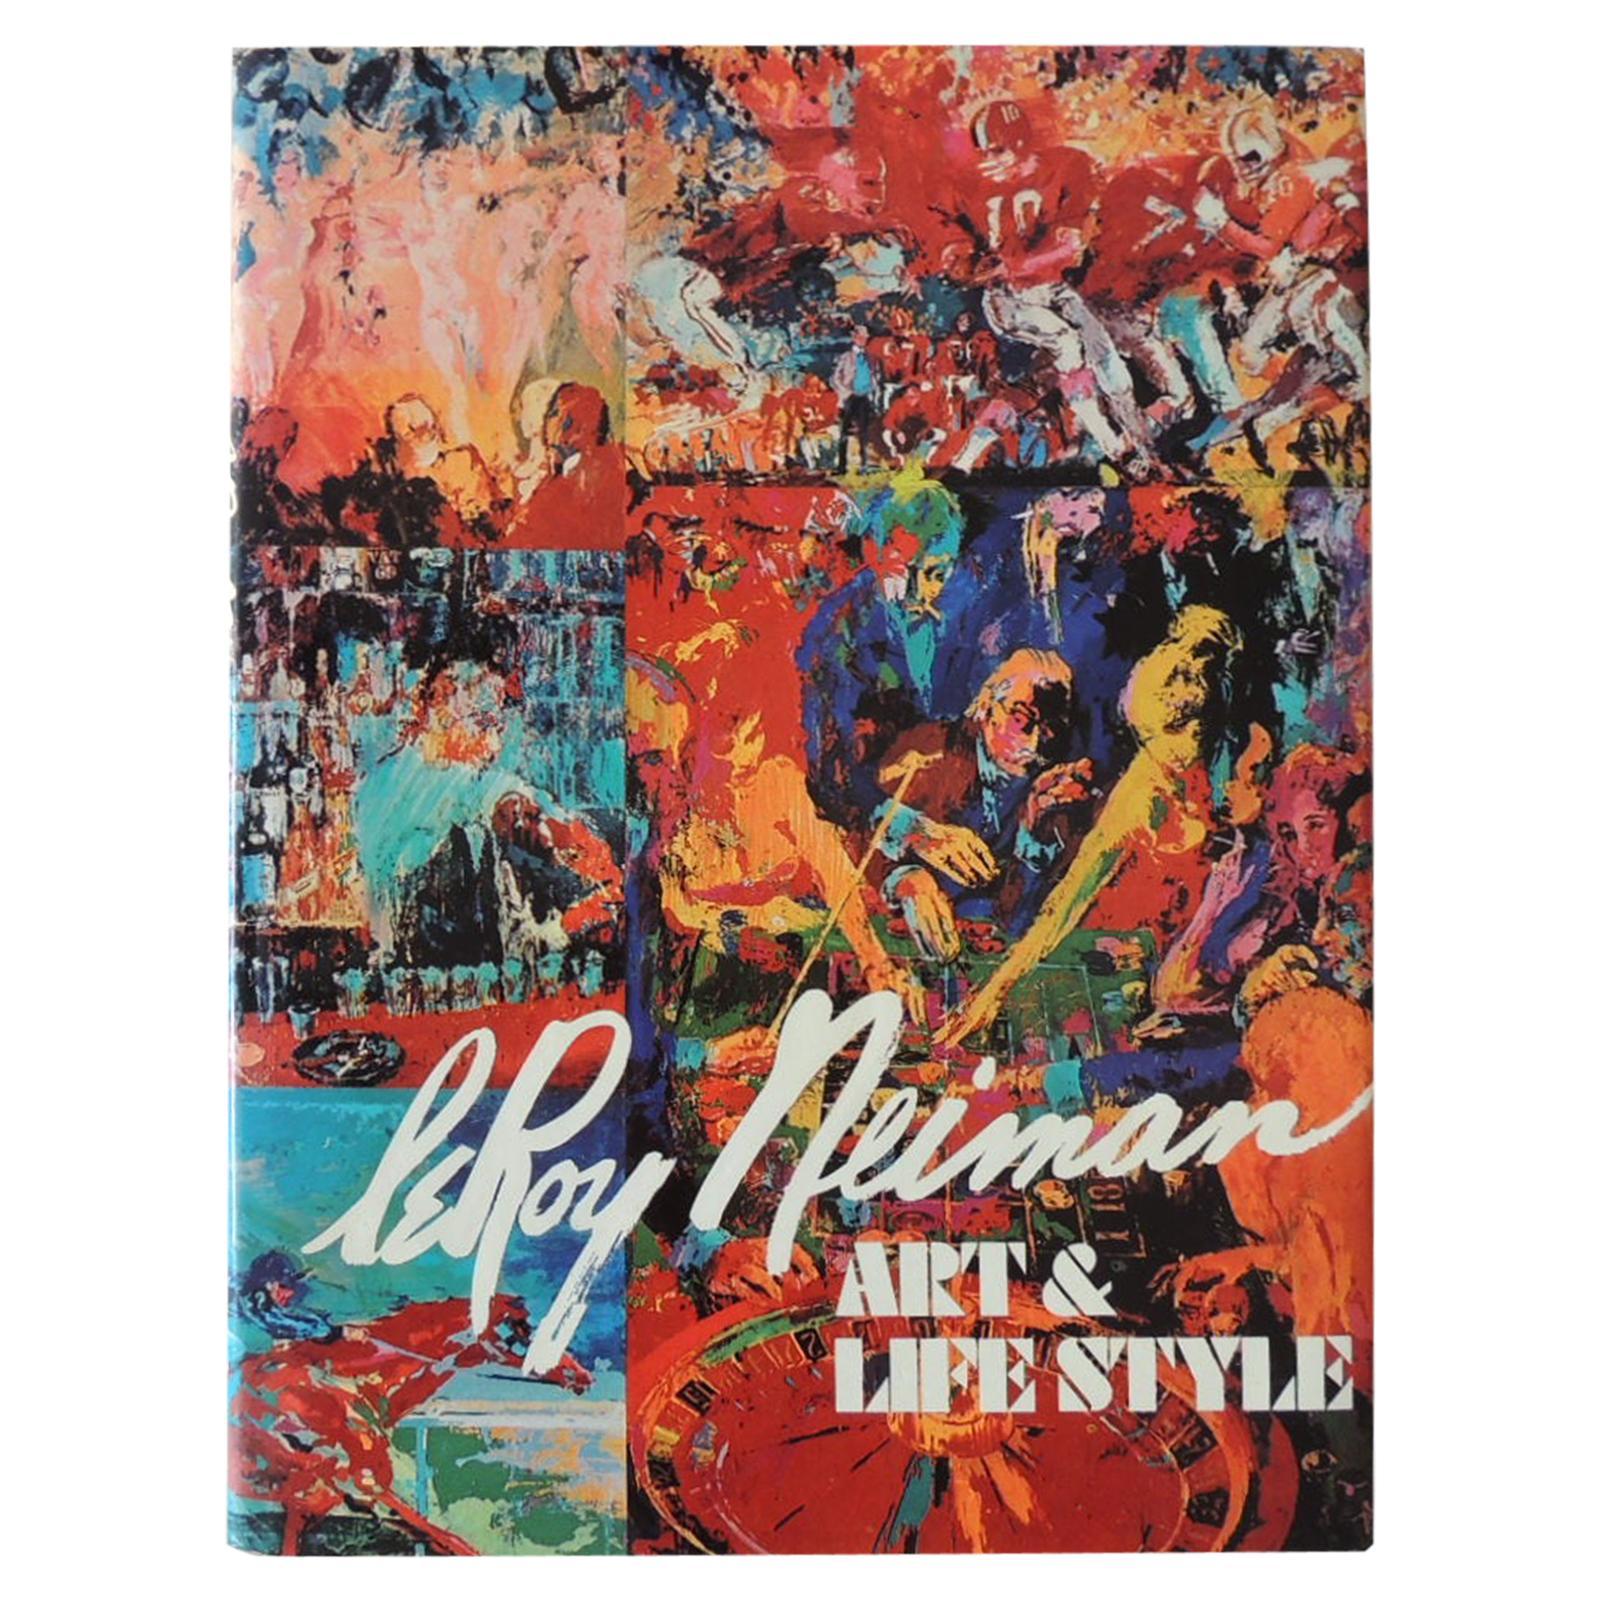 LeRoy Neiman Art & Lifestyle Hardcover Coffee Table Book